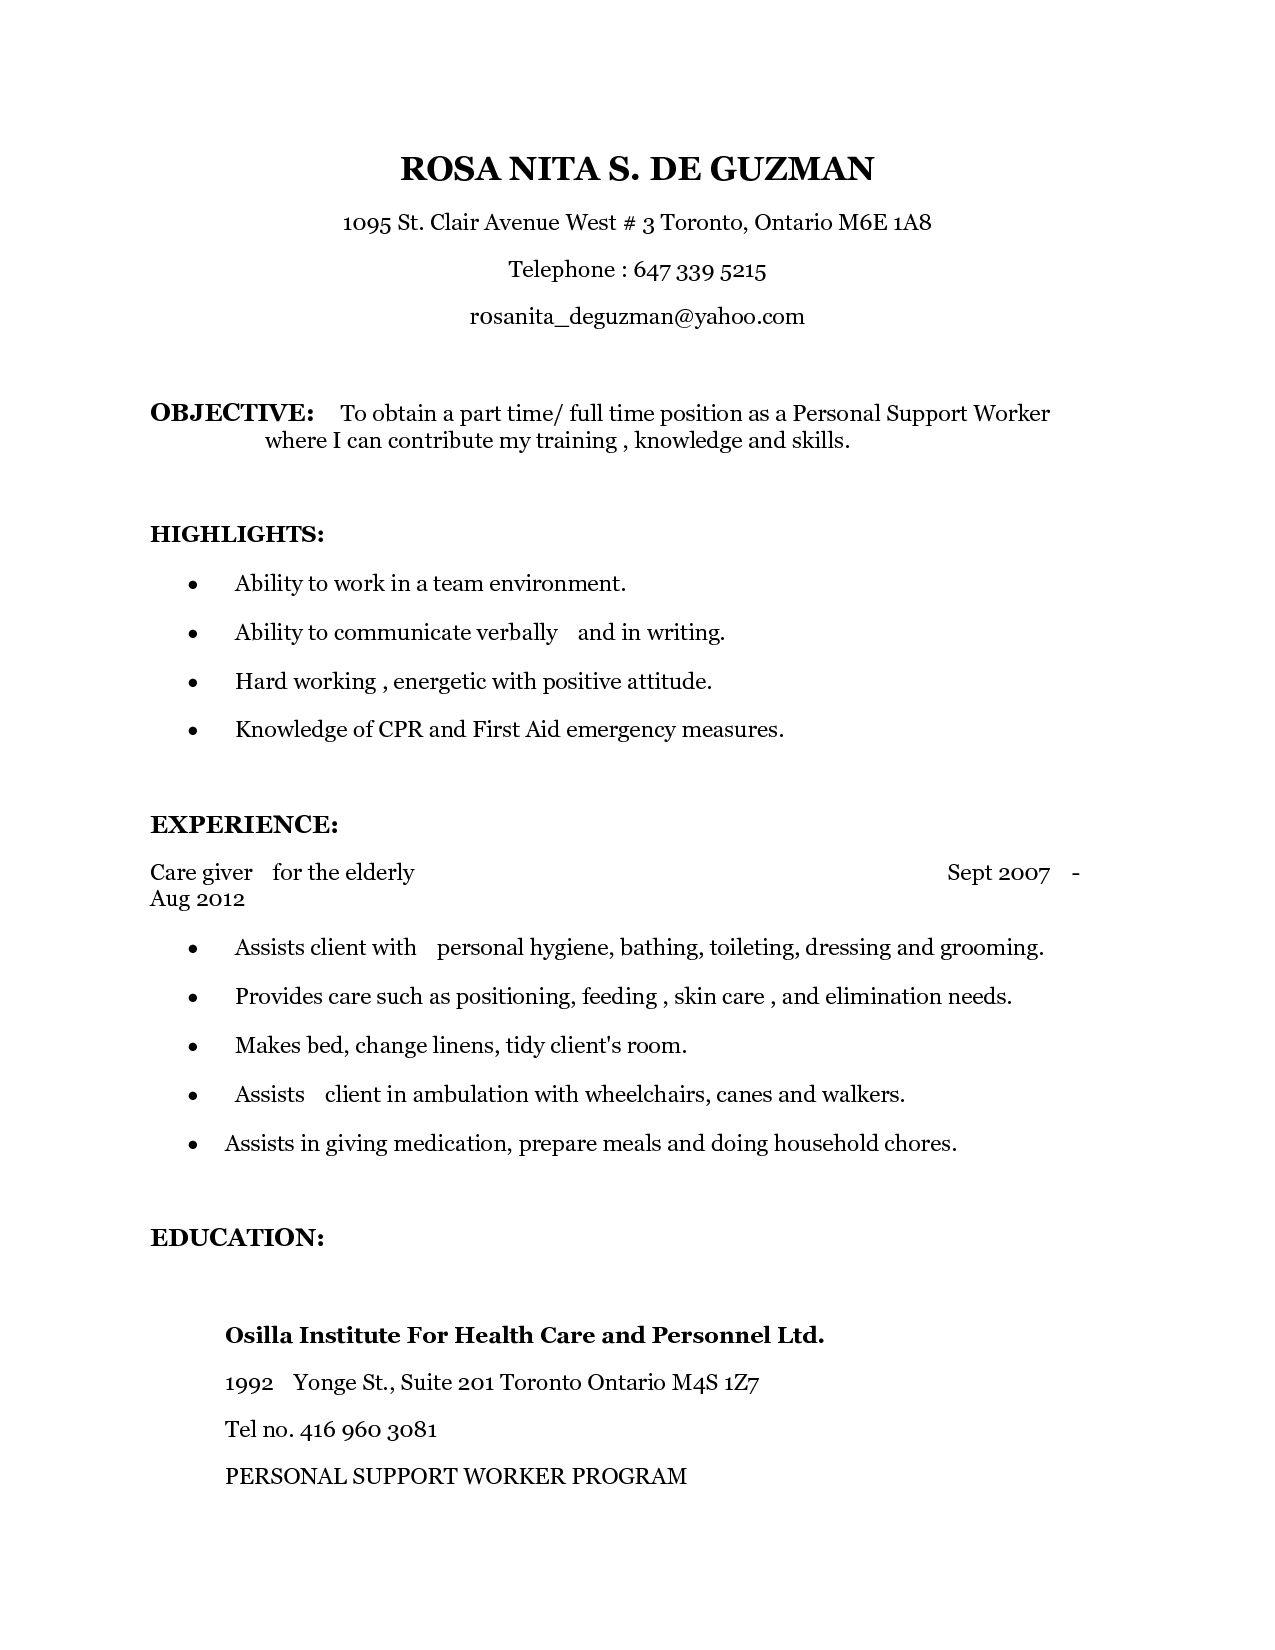 sample psw resume - Jasonkellyphoto.co